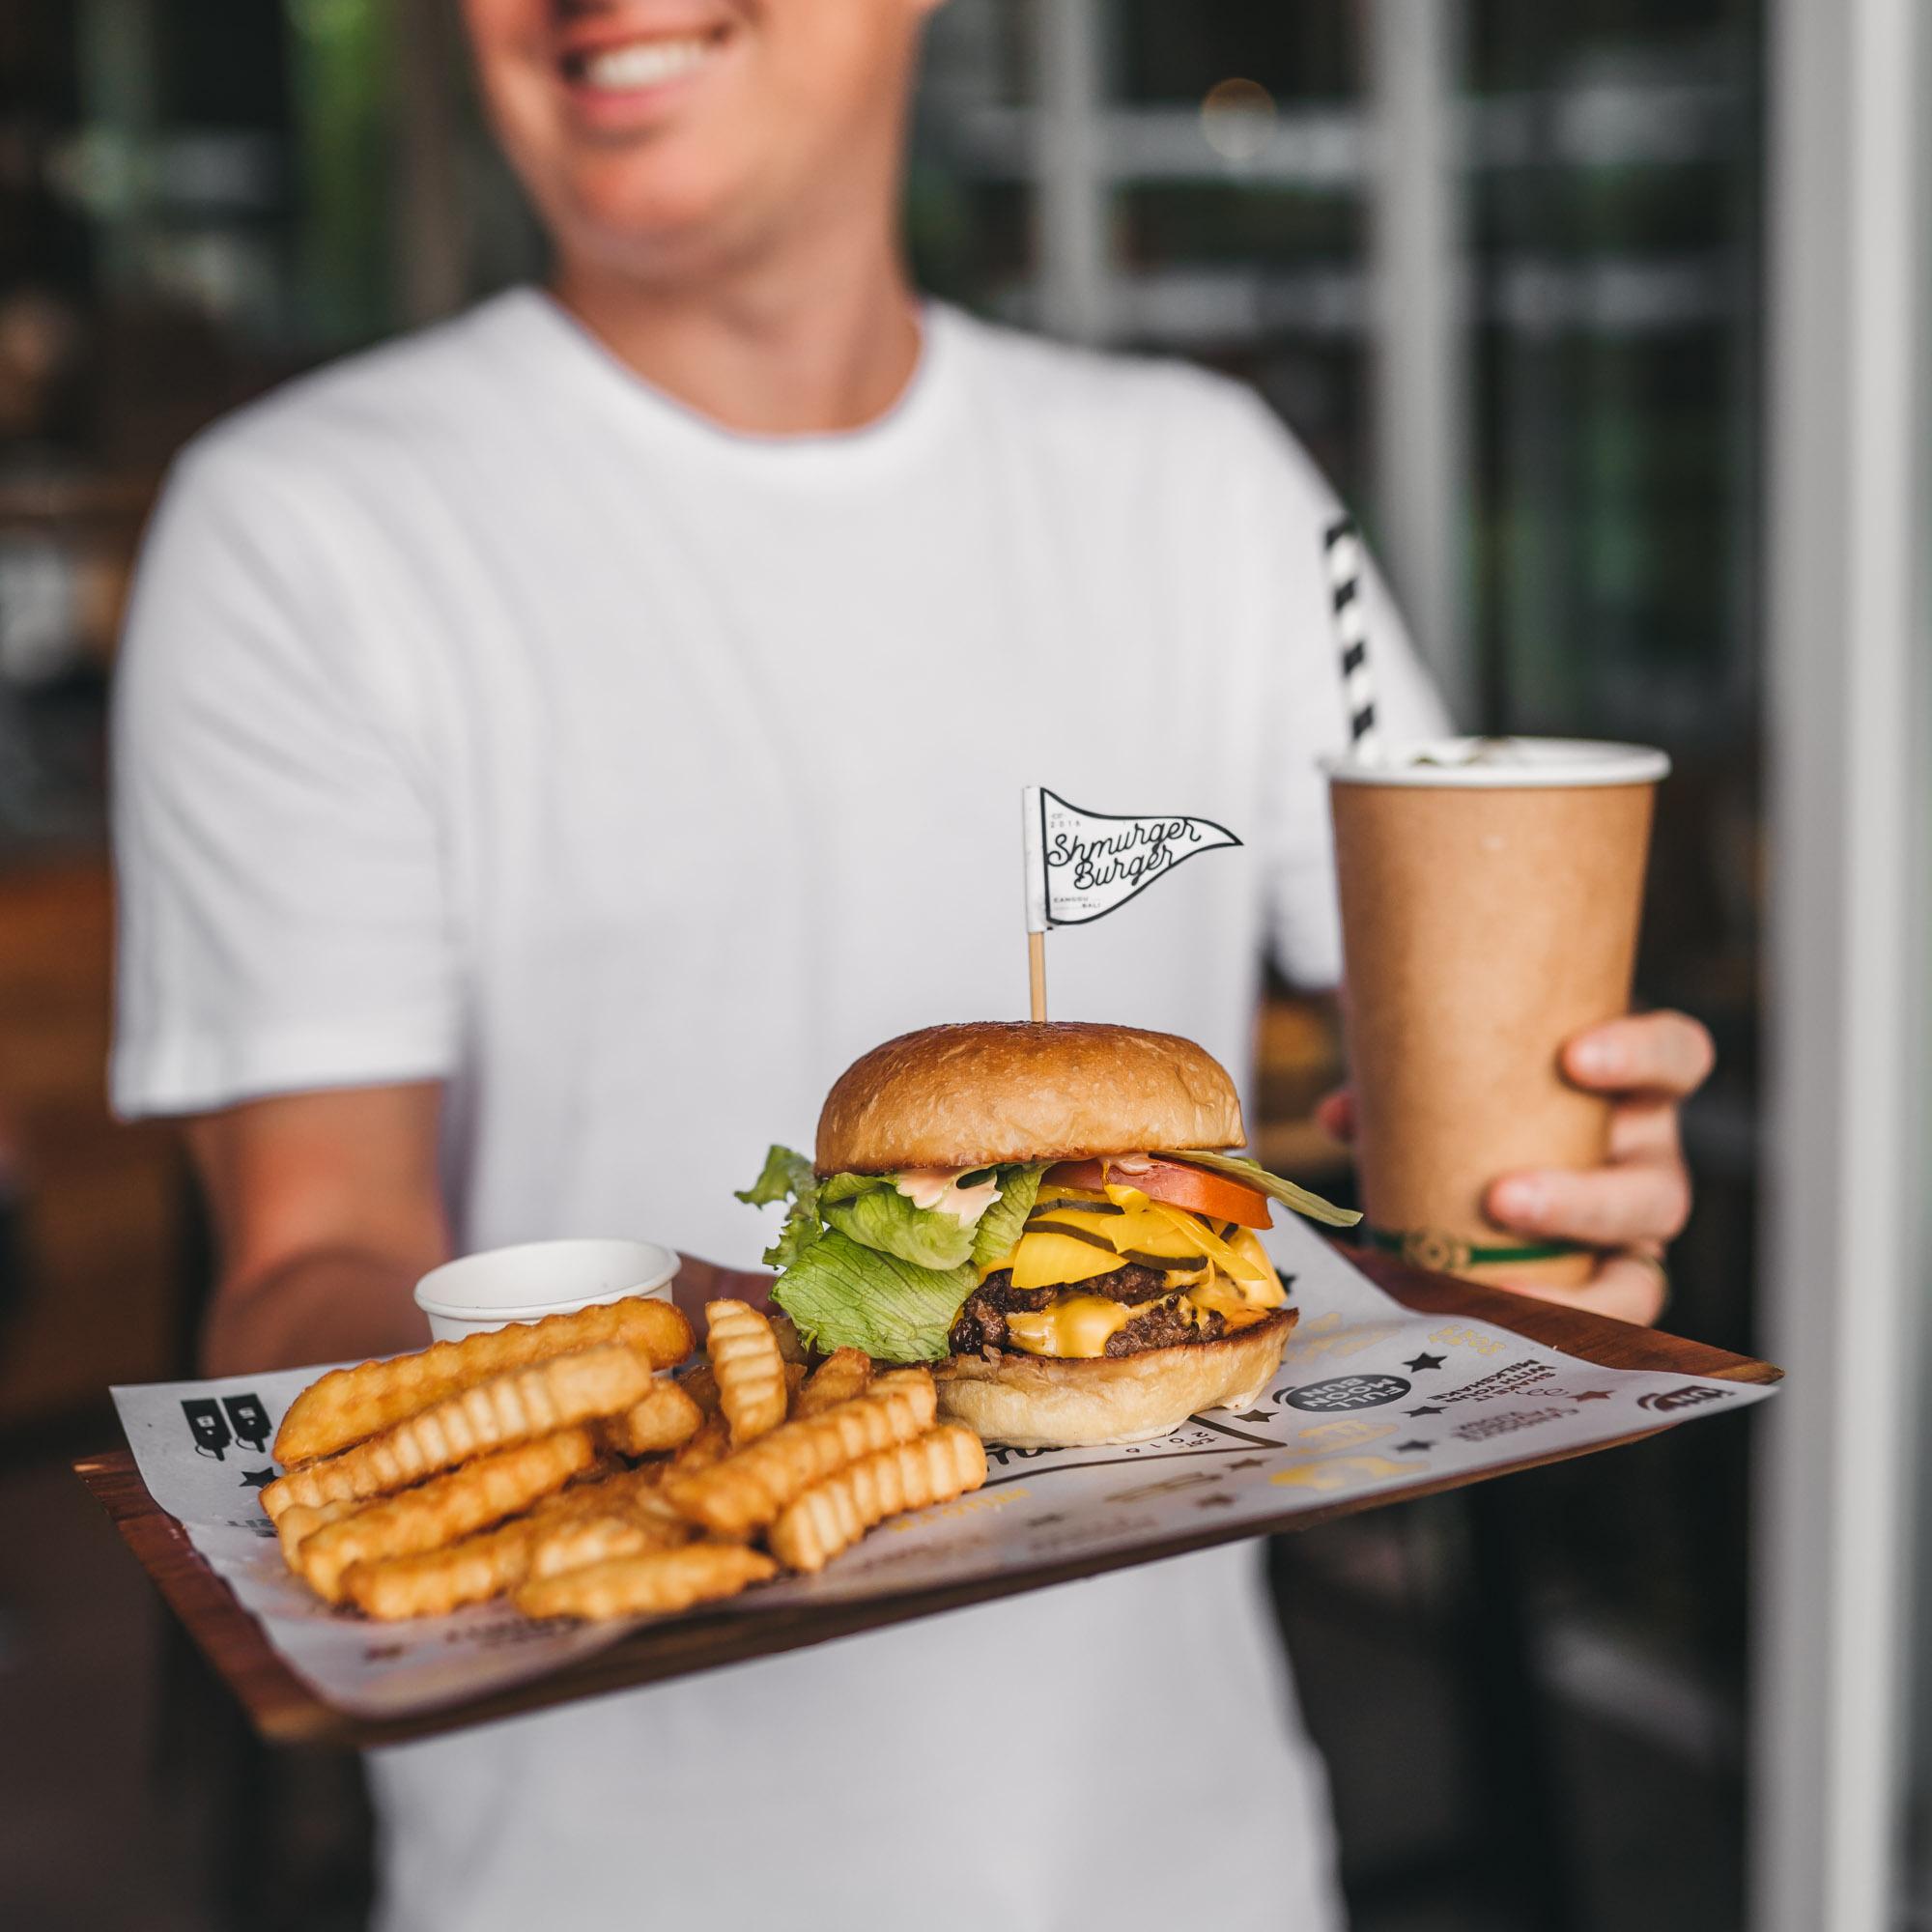 keira-mason-shmurger-burger-takeaway-burger-and-drink.jpg